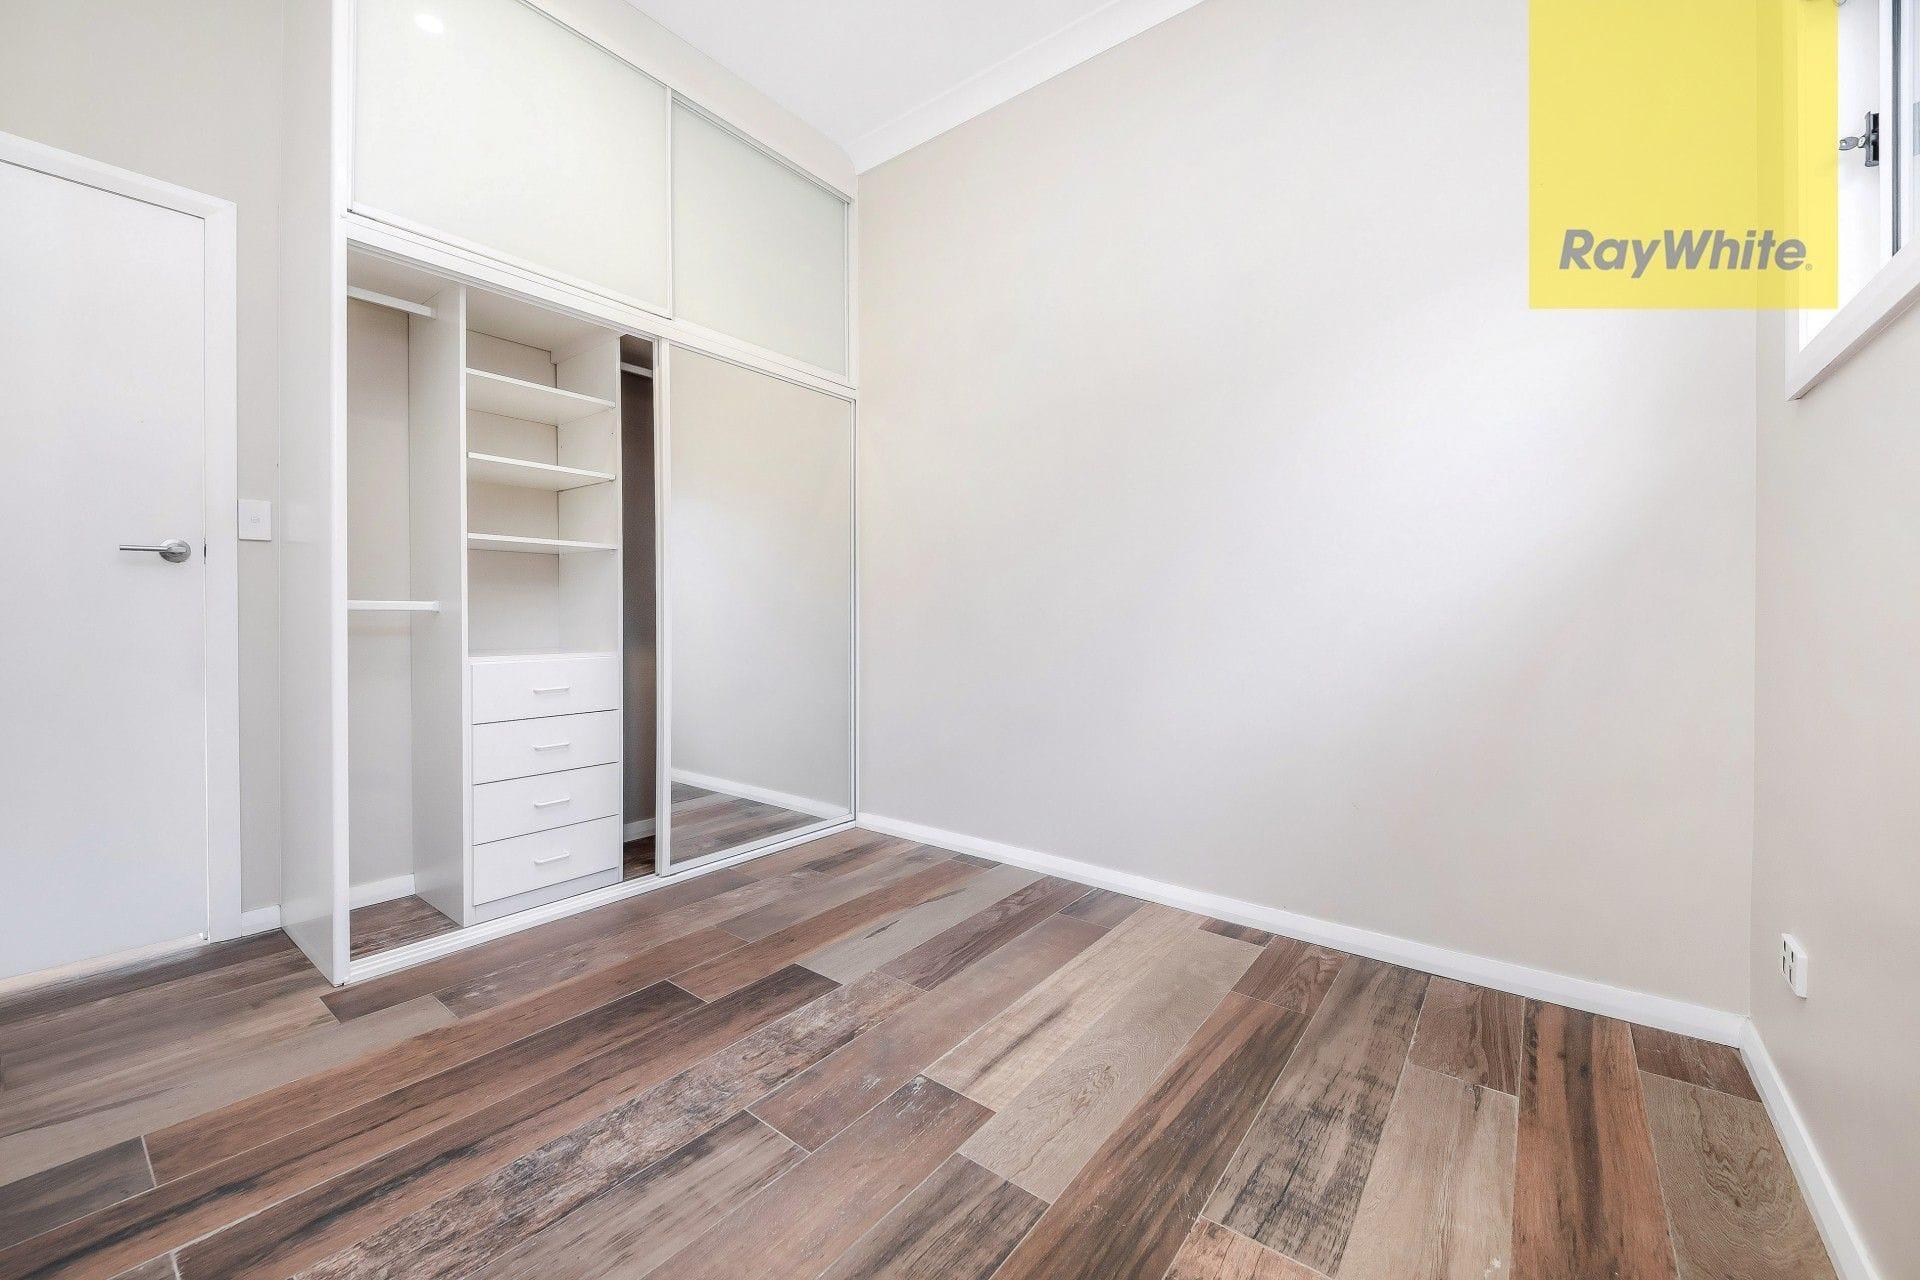 Property 1A John Street, RYDALMERE NSW 2116 IMAGE